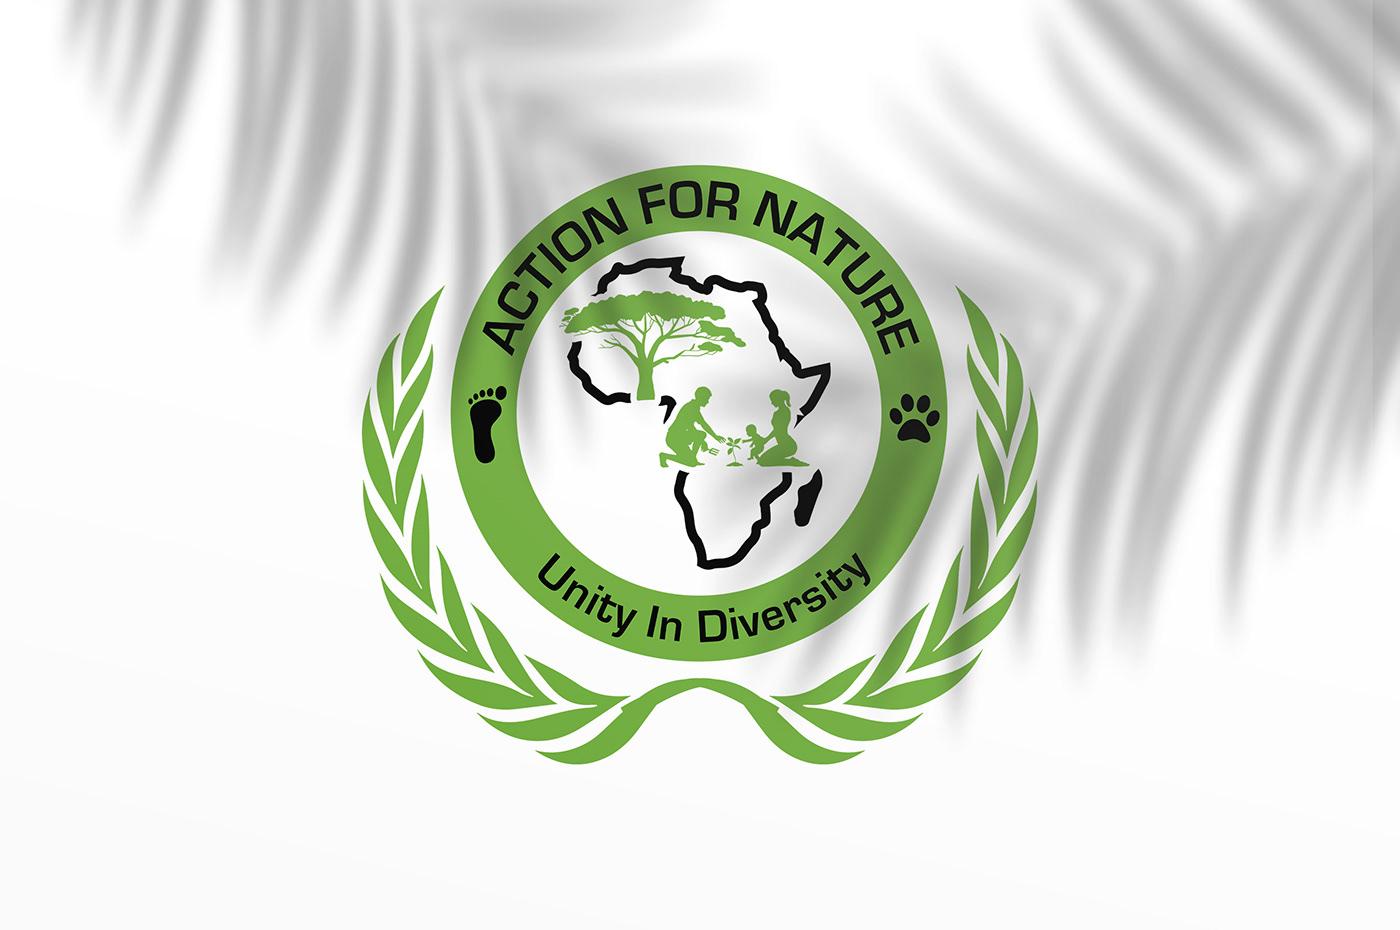 Action For Nature Africa nature logo brand identity Logo Design logo designer ya mfumu design agency